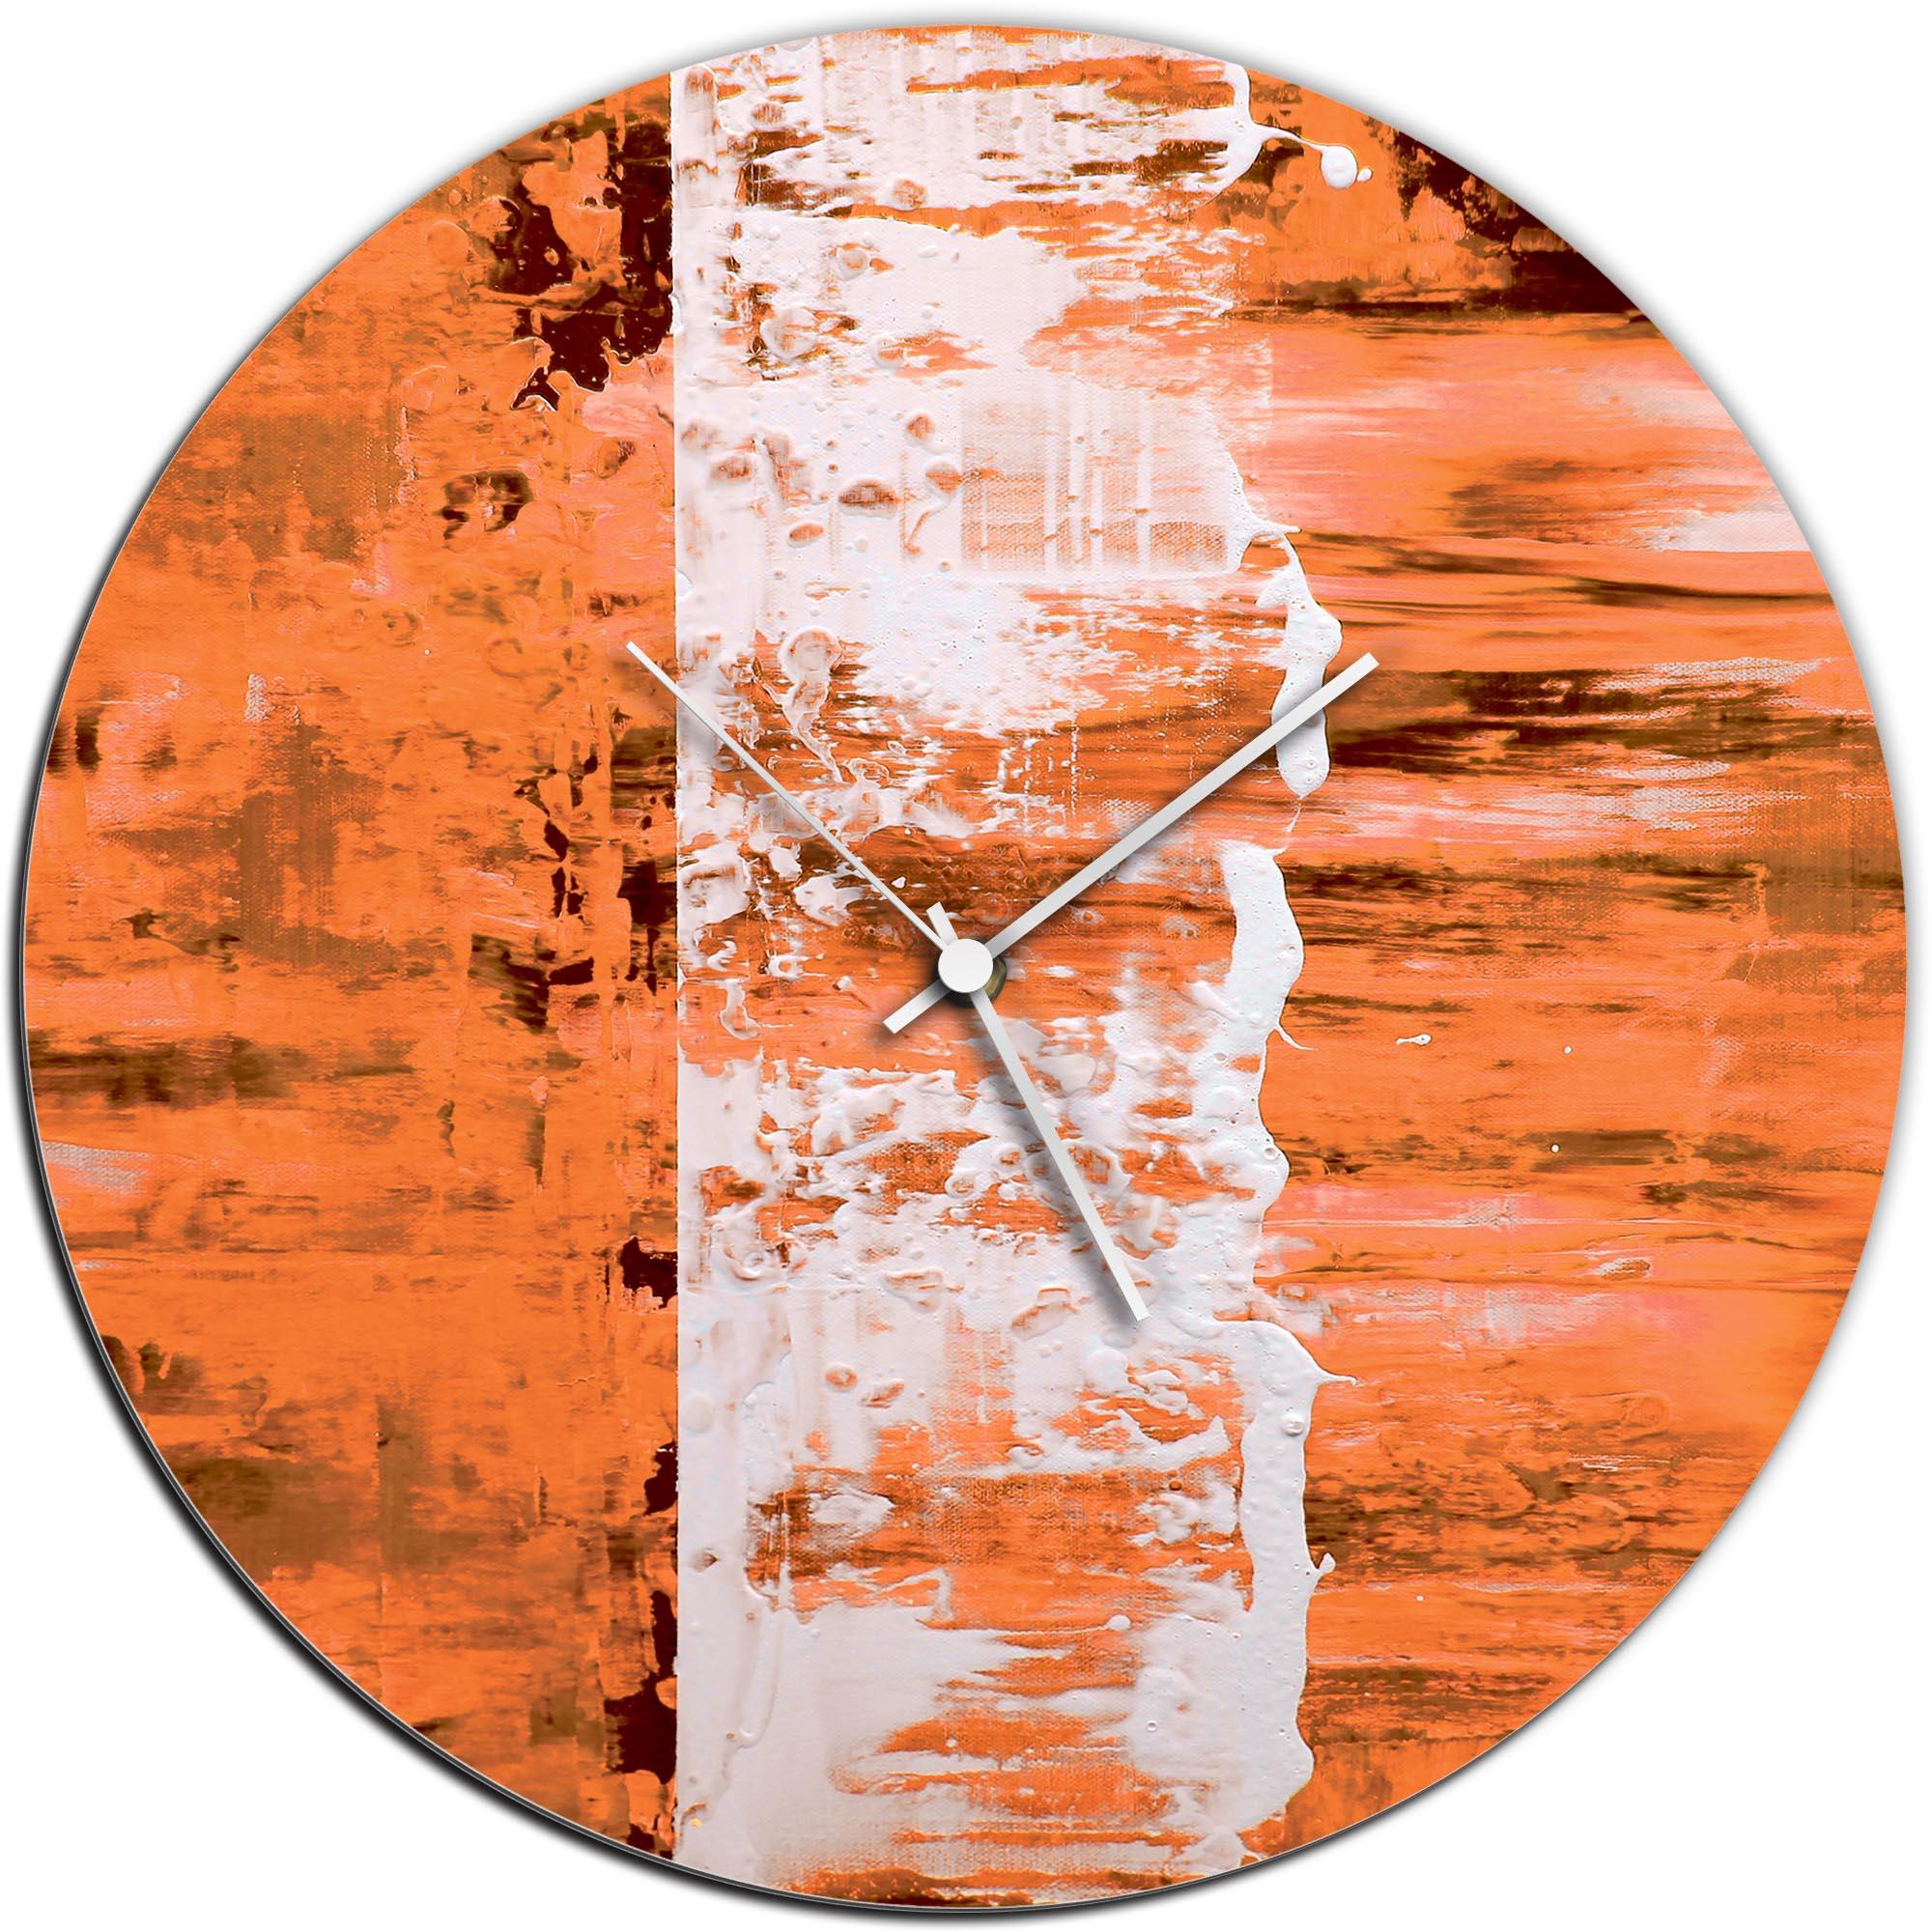 Mendo Vasilevski 'Orange Street Circle Clock' 16in x 16in Modern Wall Clock on Aluminum Composite